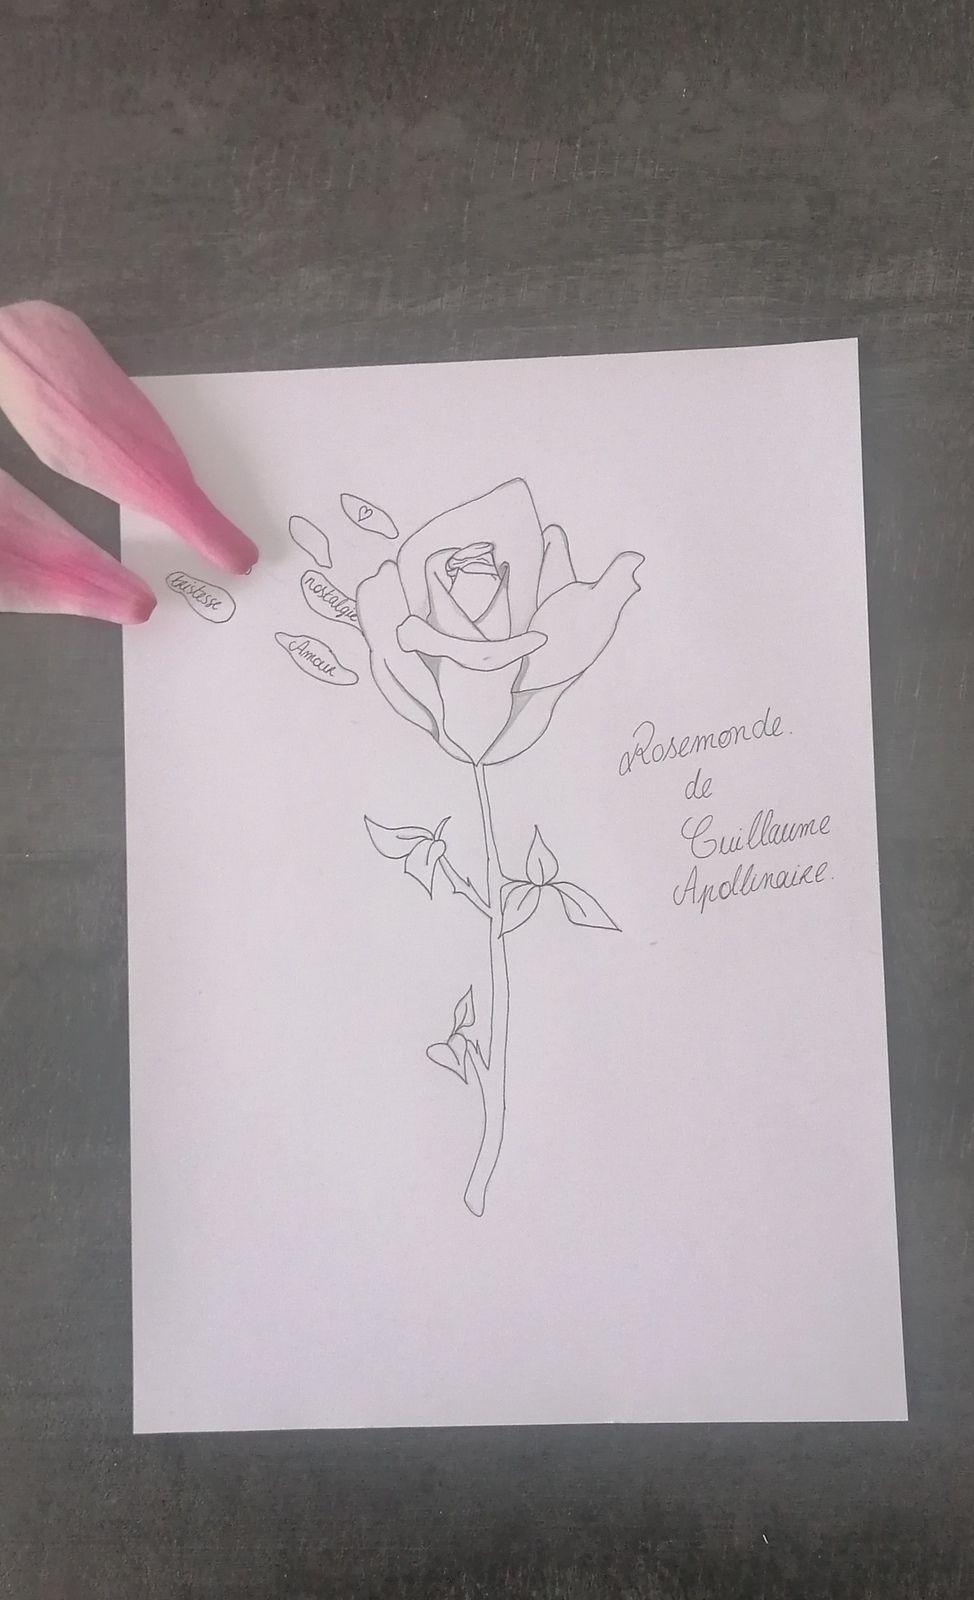 Selfie de poème - Rosemonde